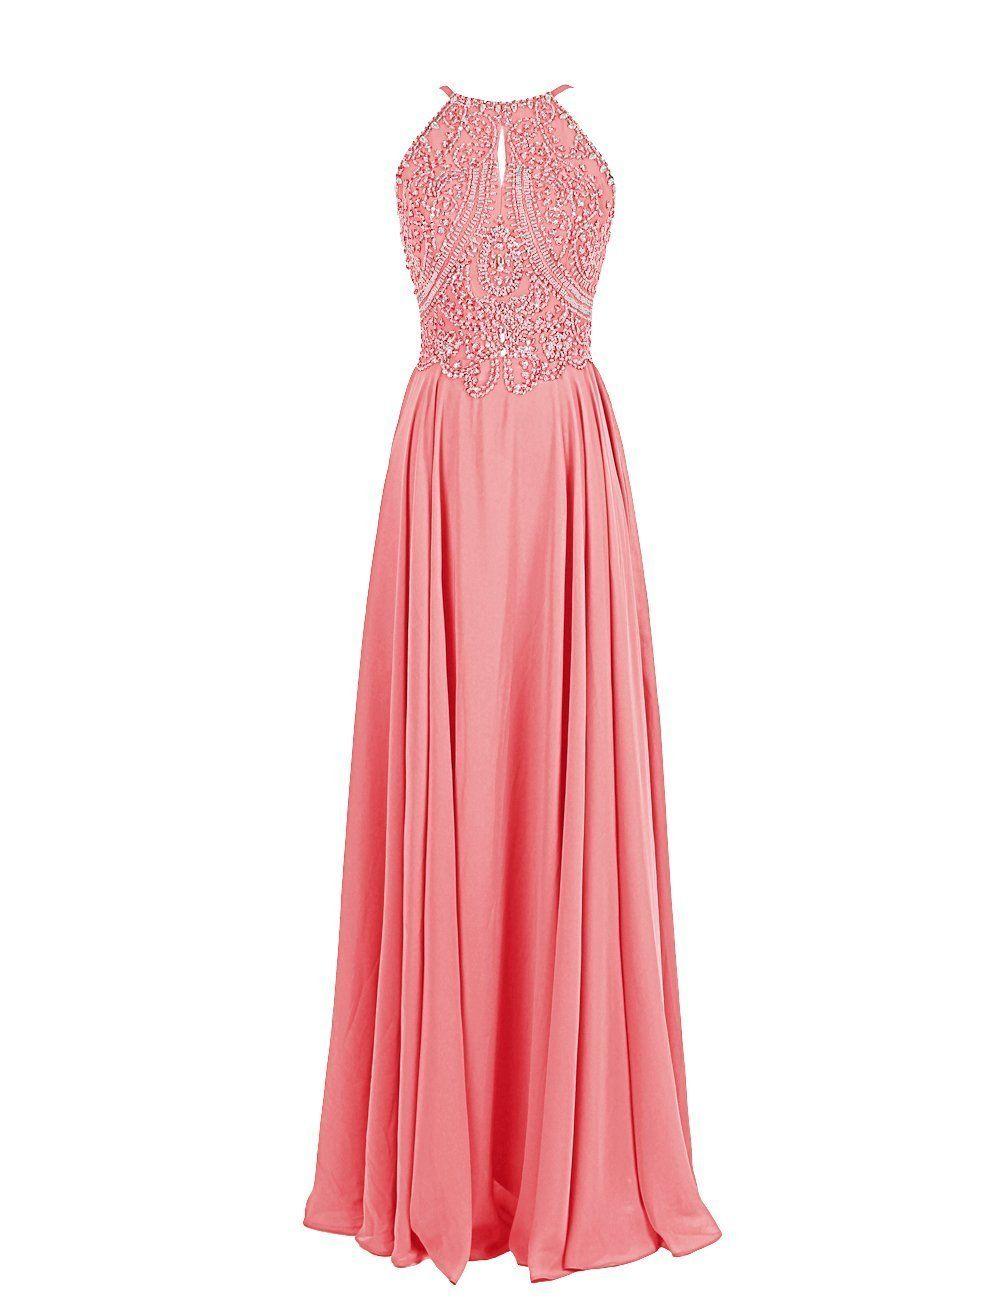 Bessdress long chiffon prom dresses beaded bodice evening dresses